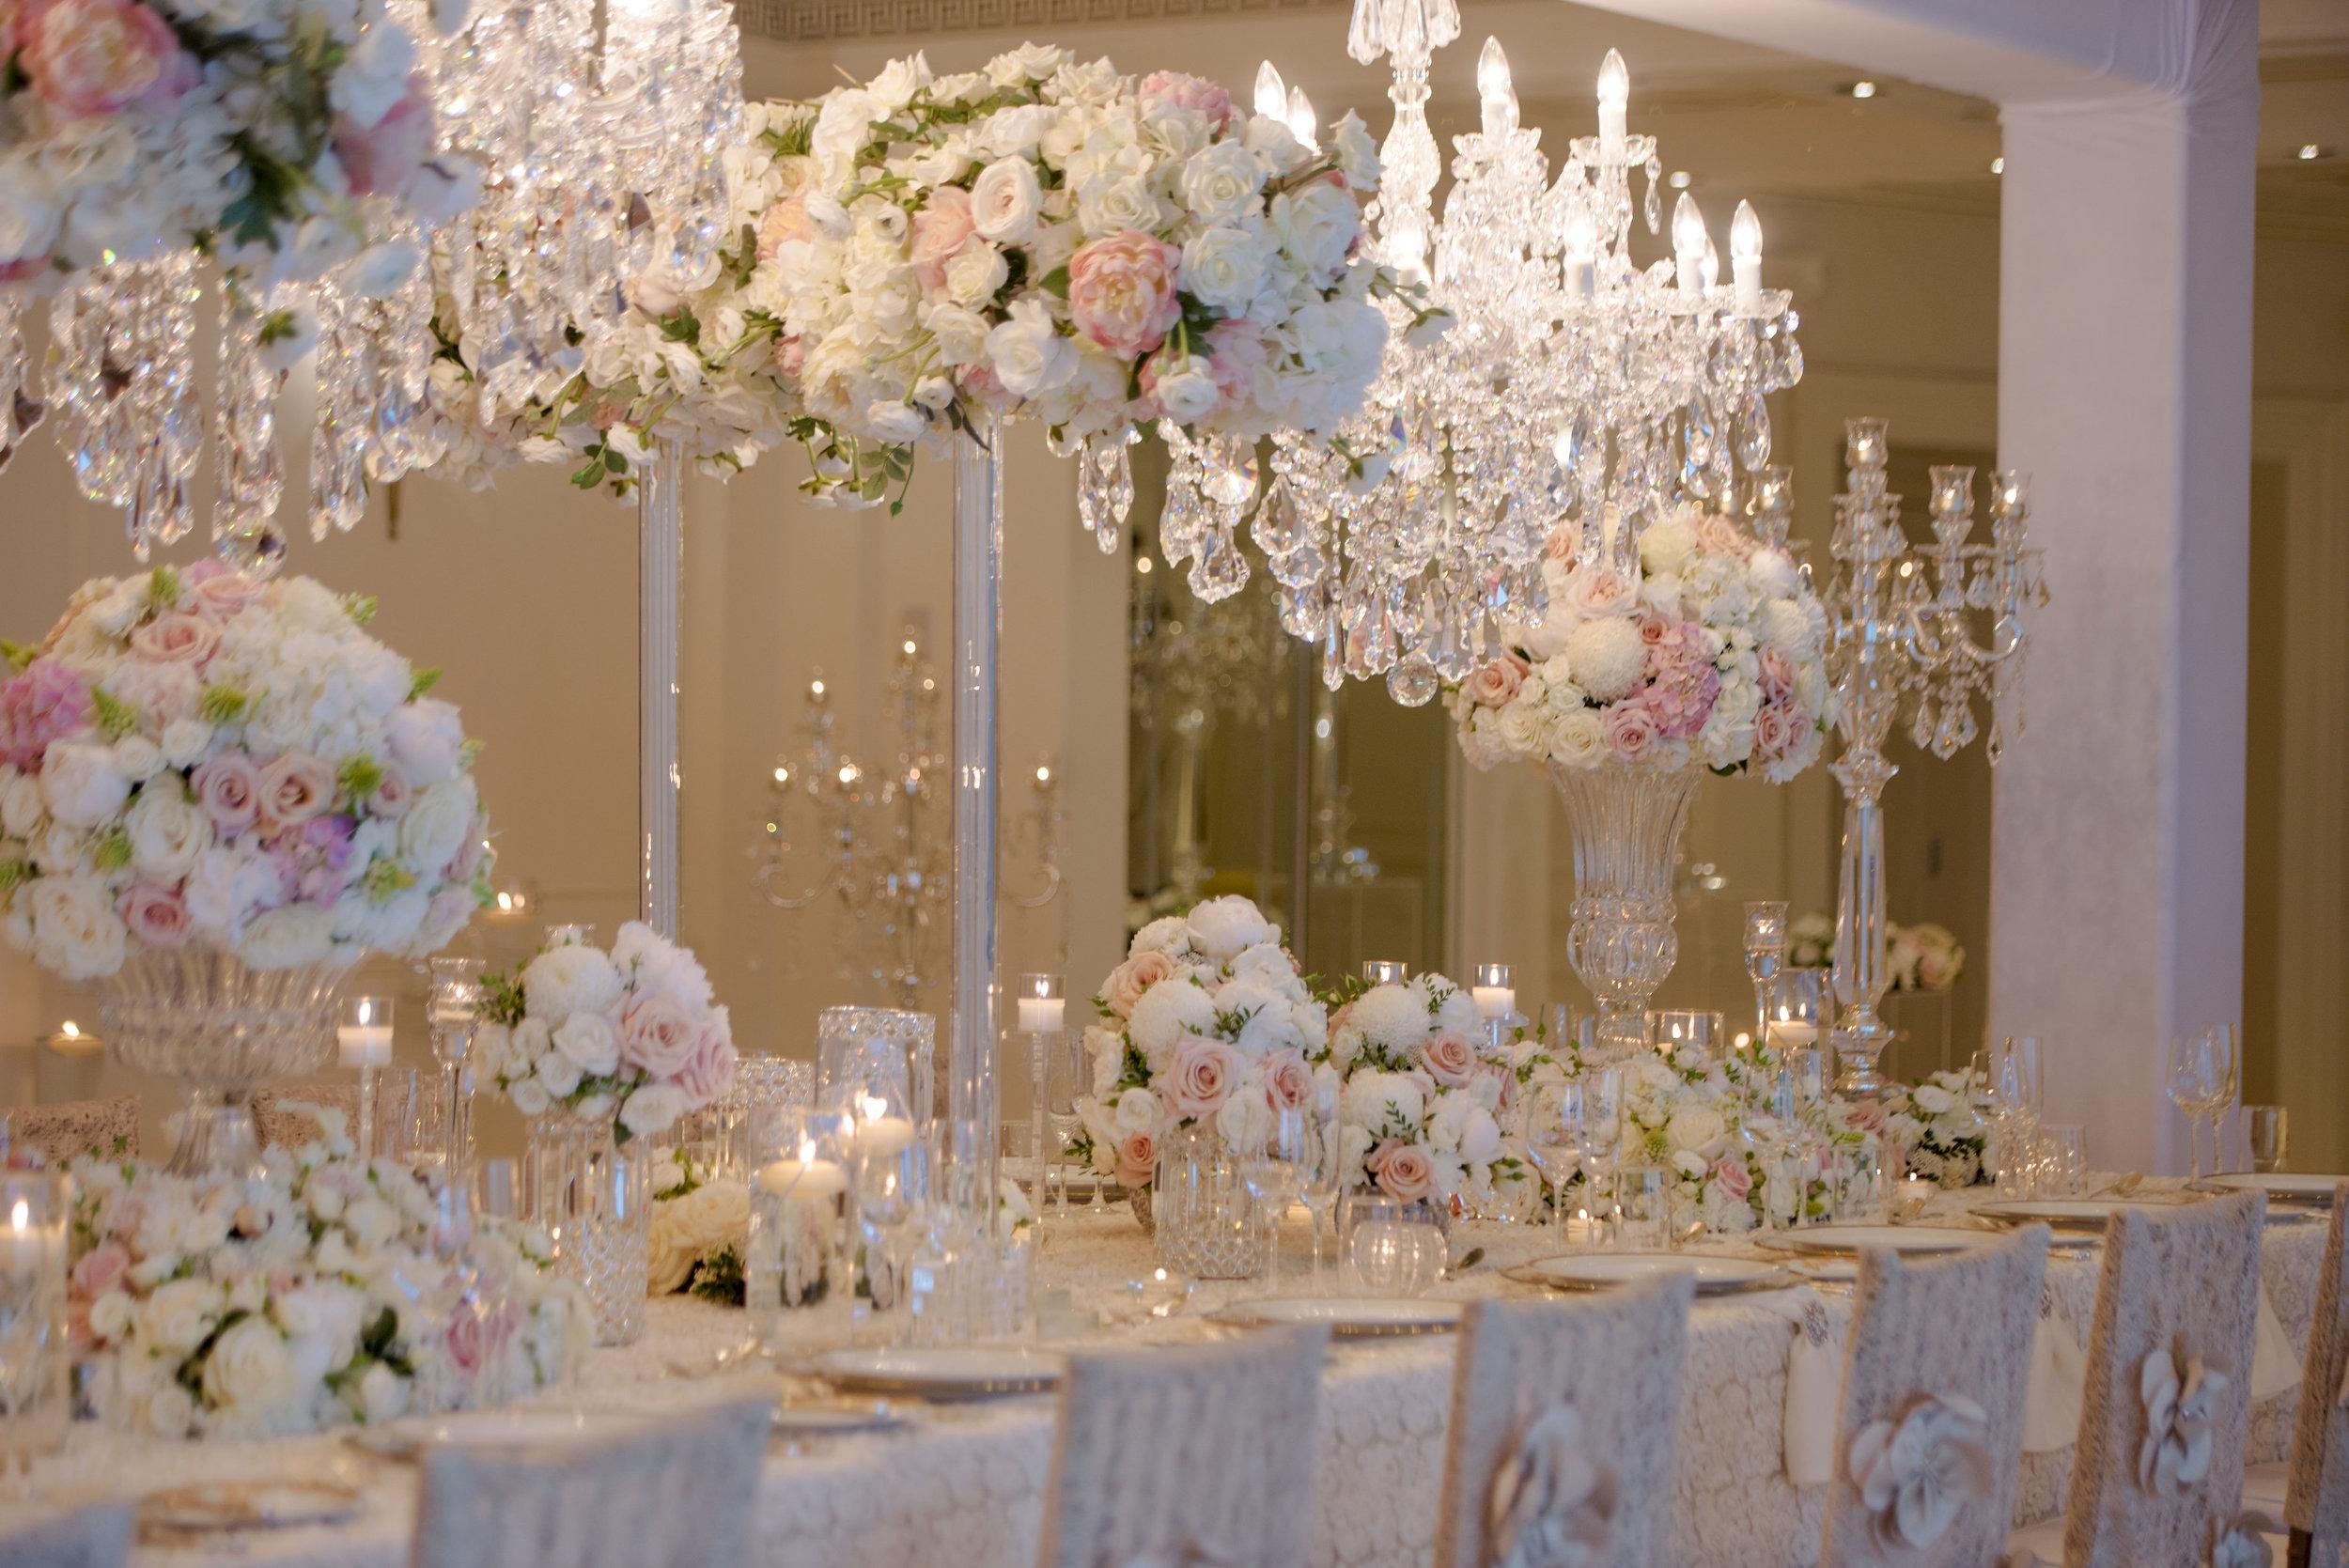 Hire_Ivory_rose_luxury_linen_sydney_wedding_decor_event_Versace_Decor_king_table.jpg